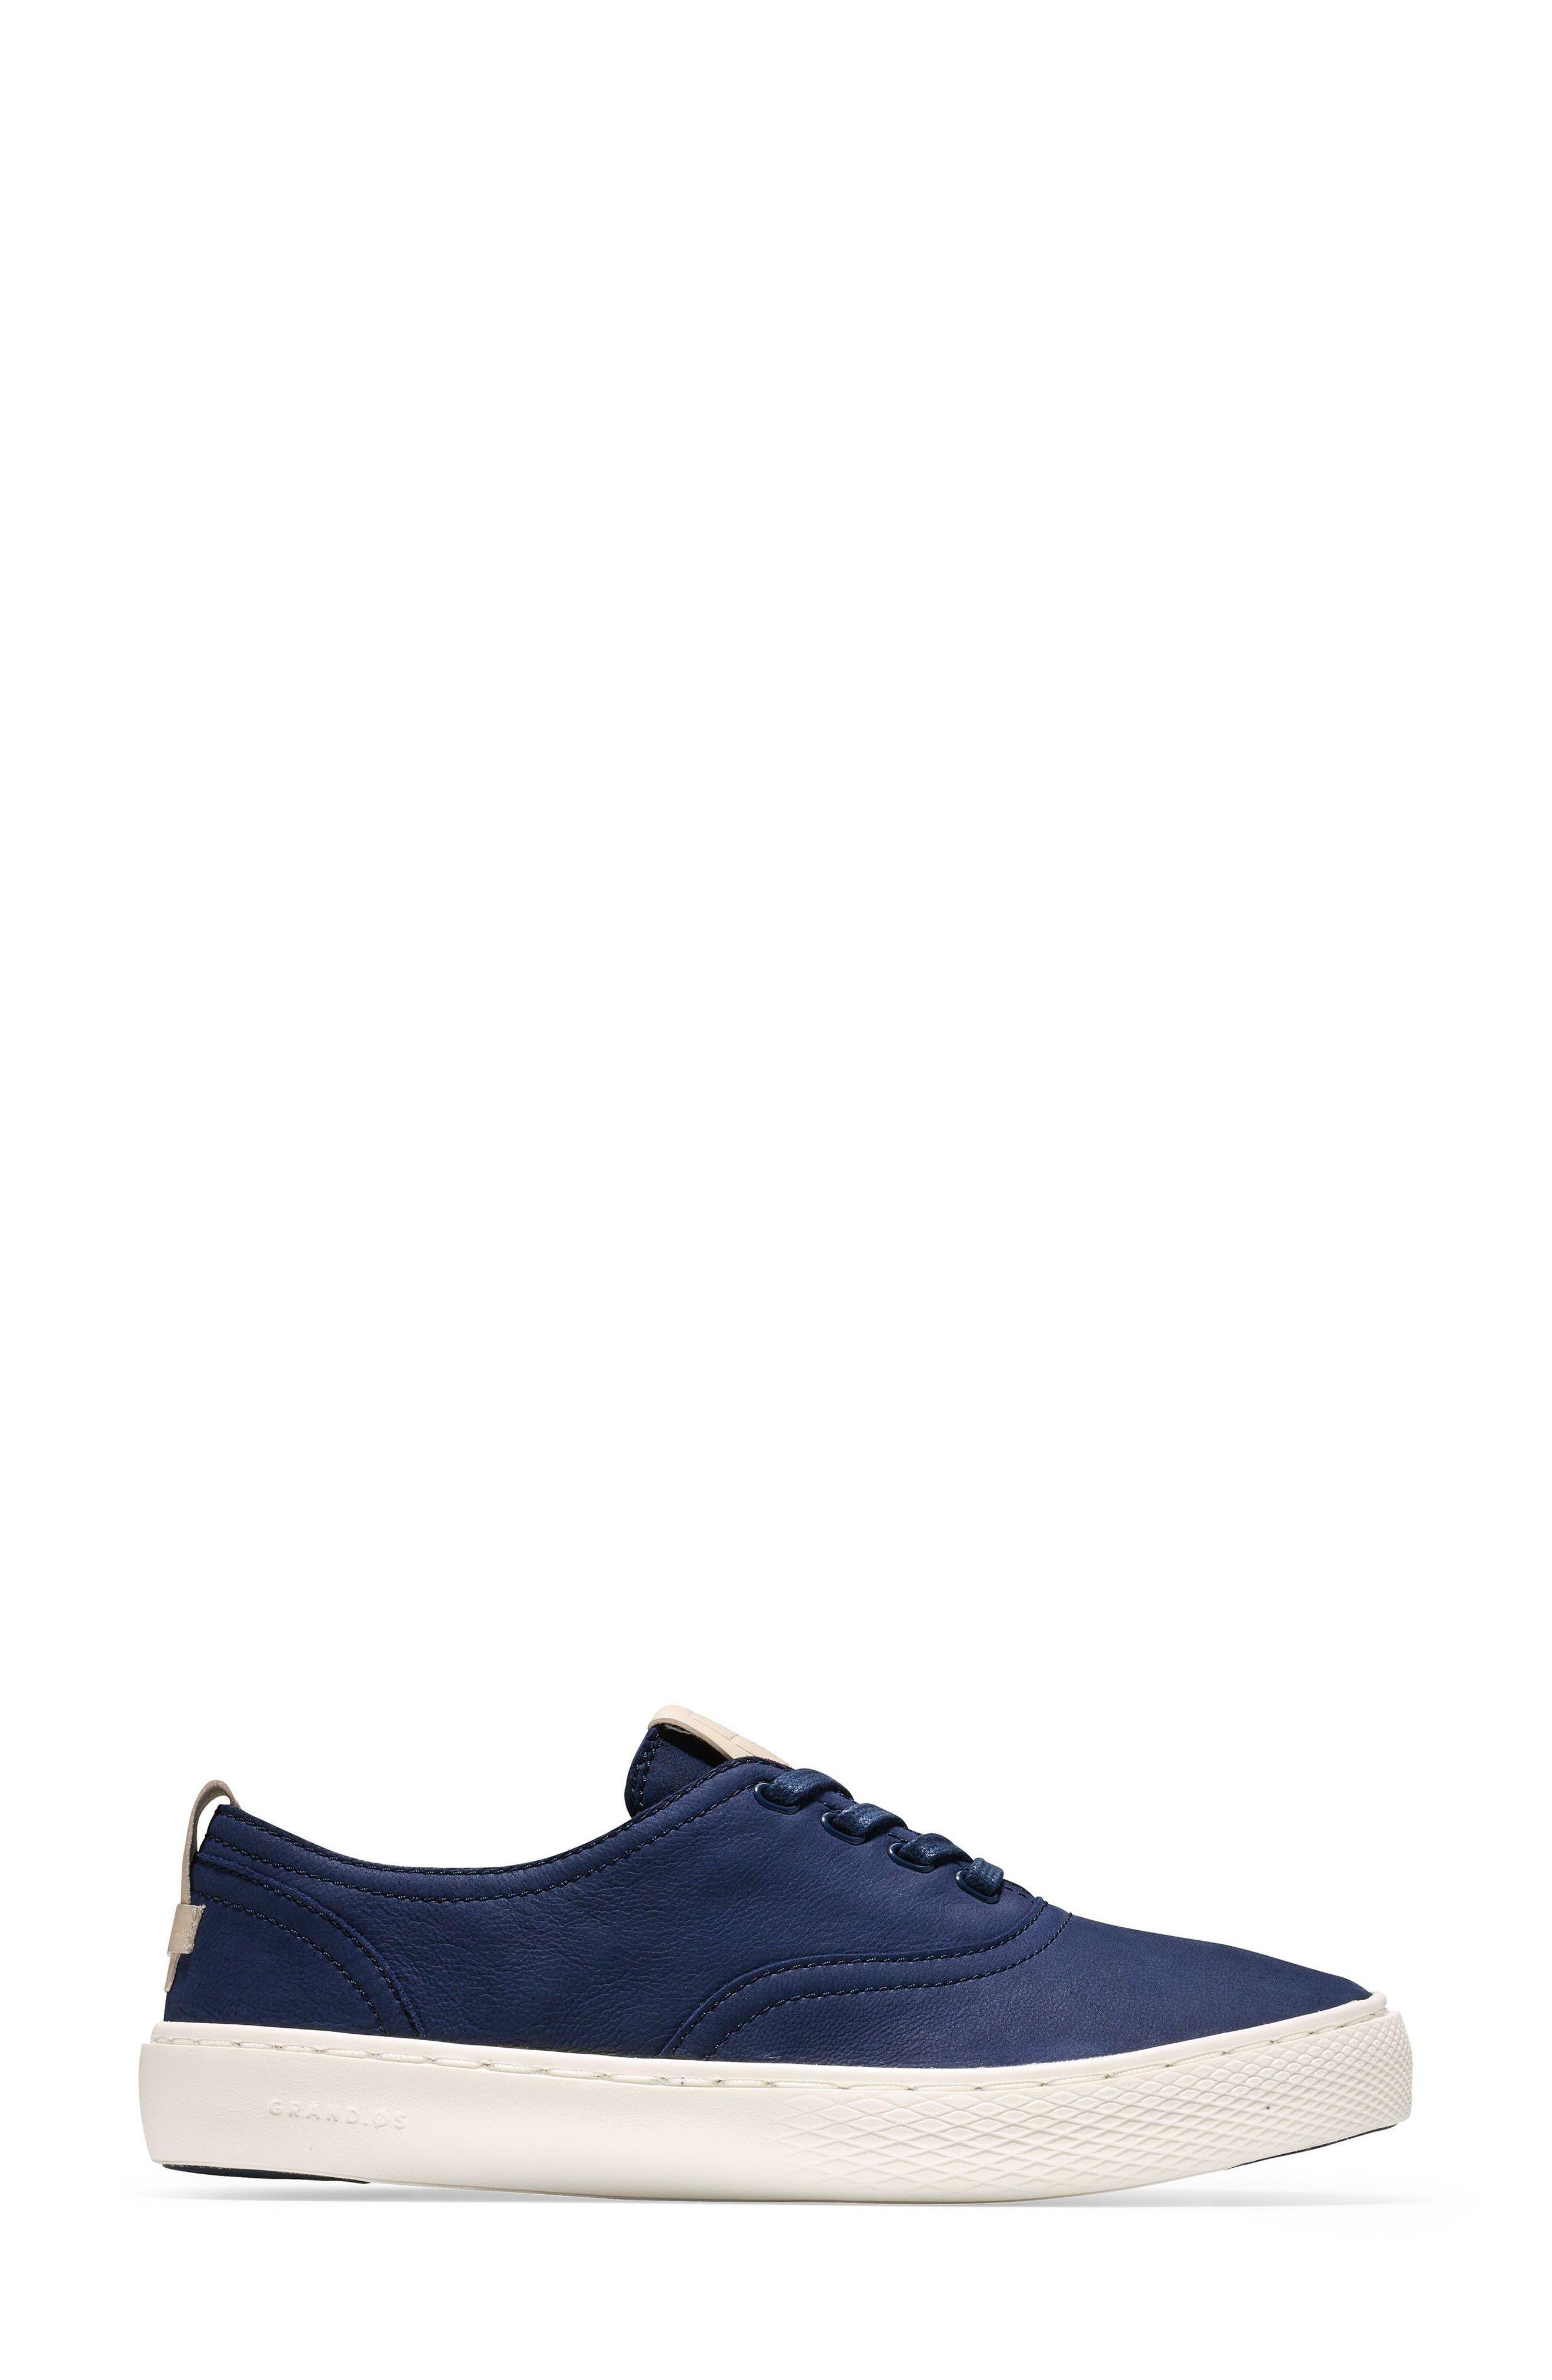 GrandPro Deck Sneaker,                             Alternate thumbnail 3, color,                             Blue/ White Nubuck